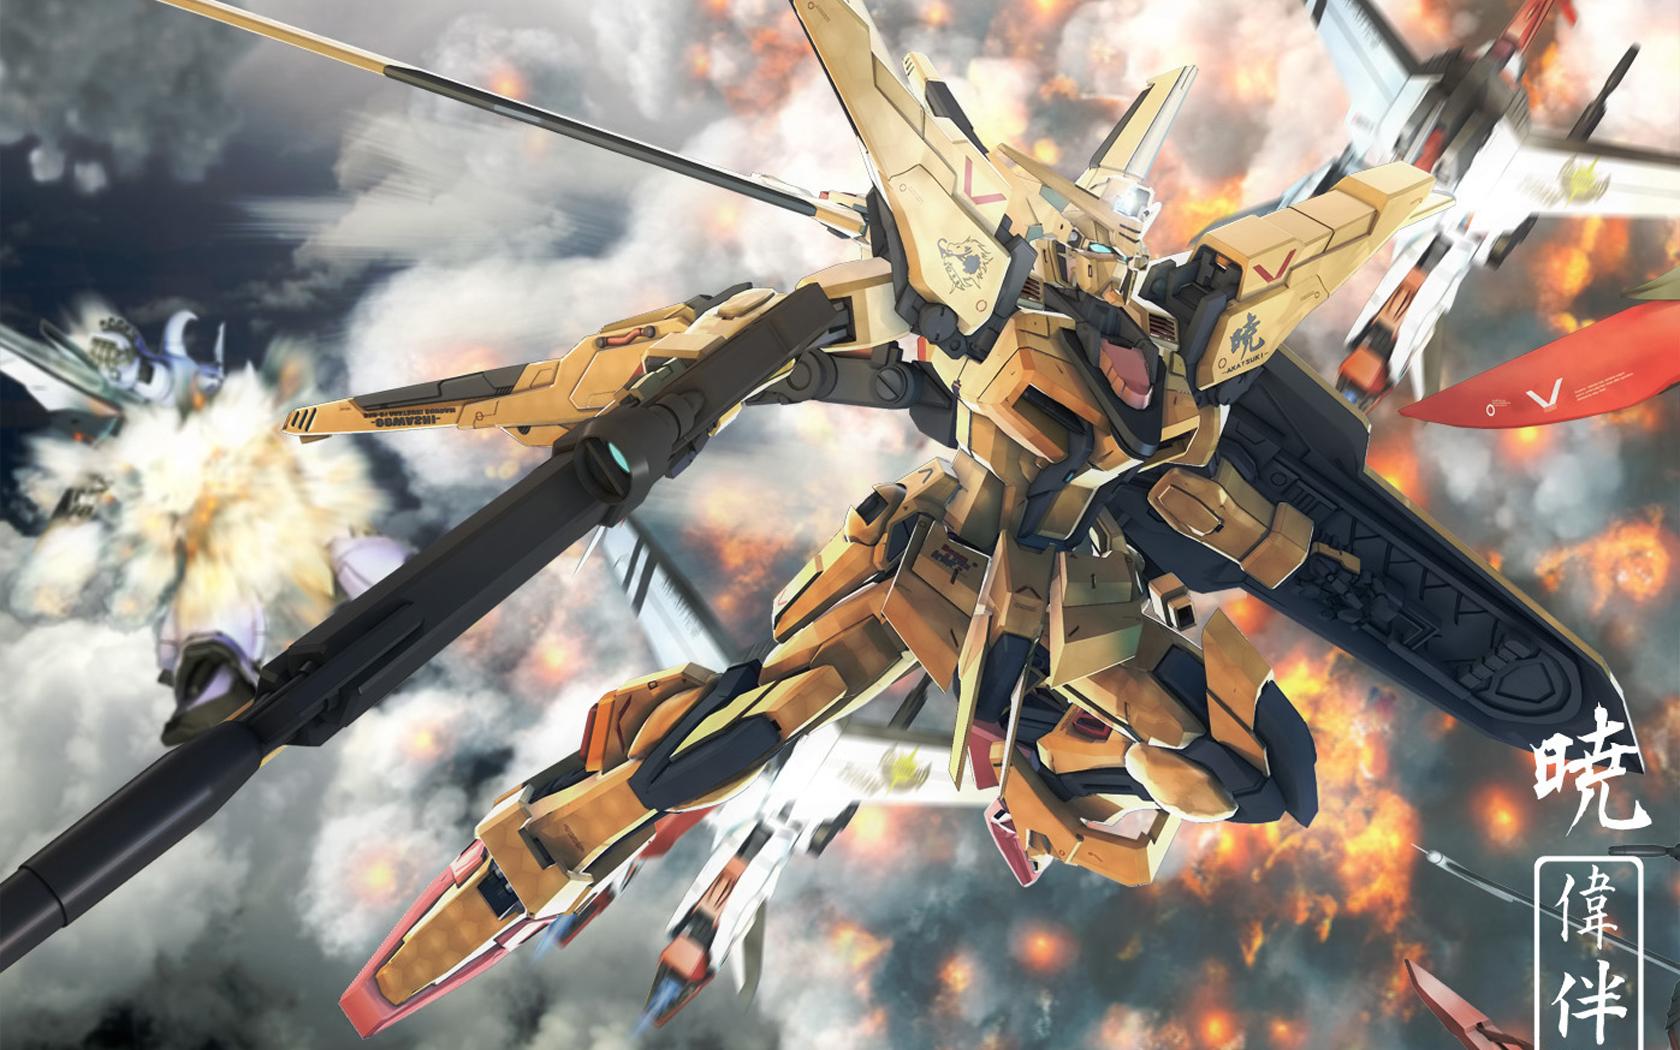 Gundam Gundam Wallpaper 1680x1050 Gundam Gundam Seed Gundam Seed 1680x1050